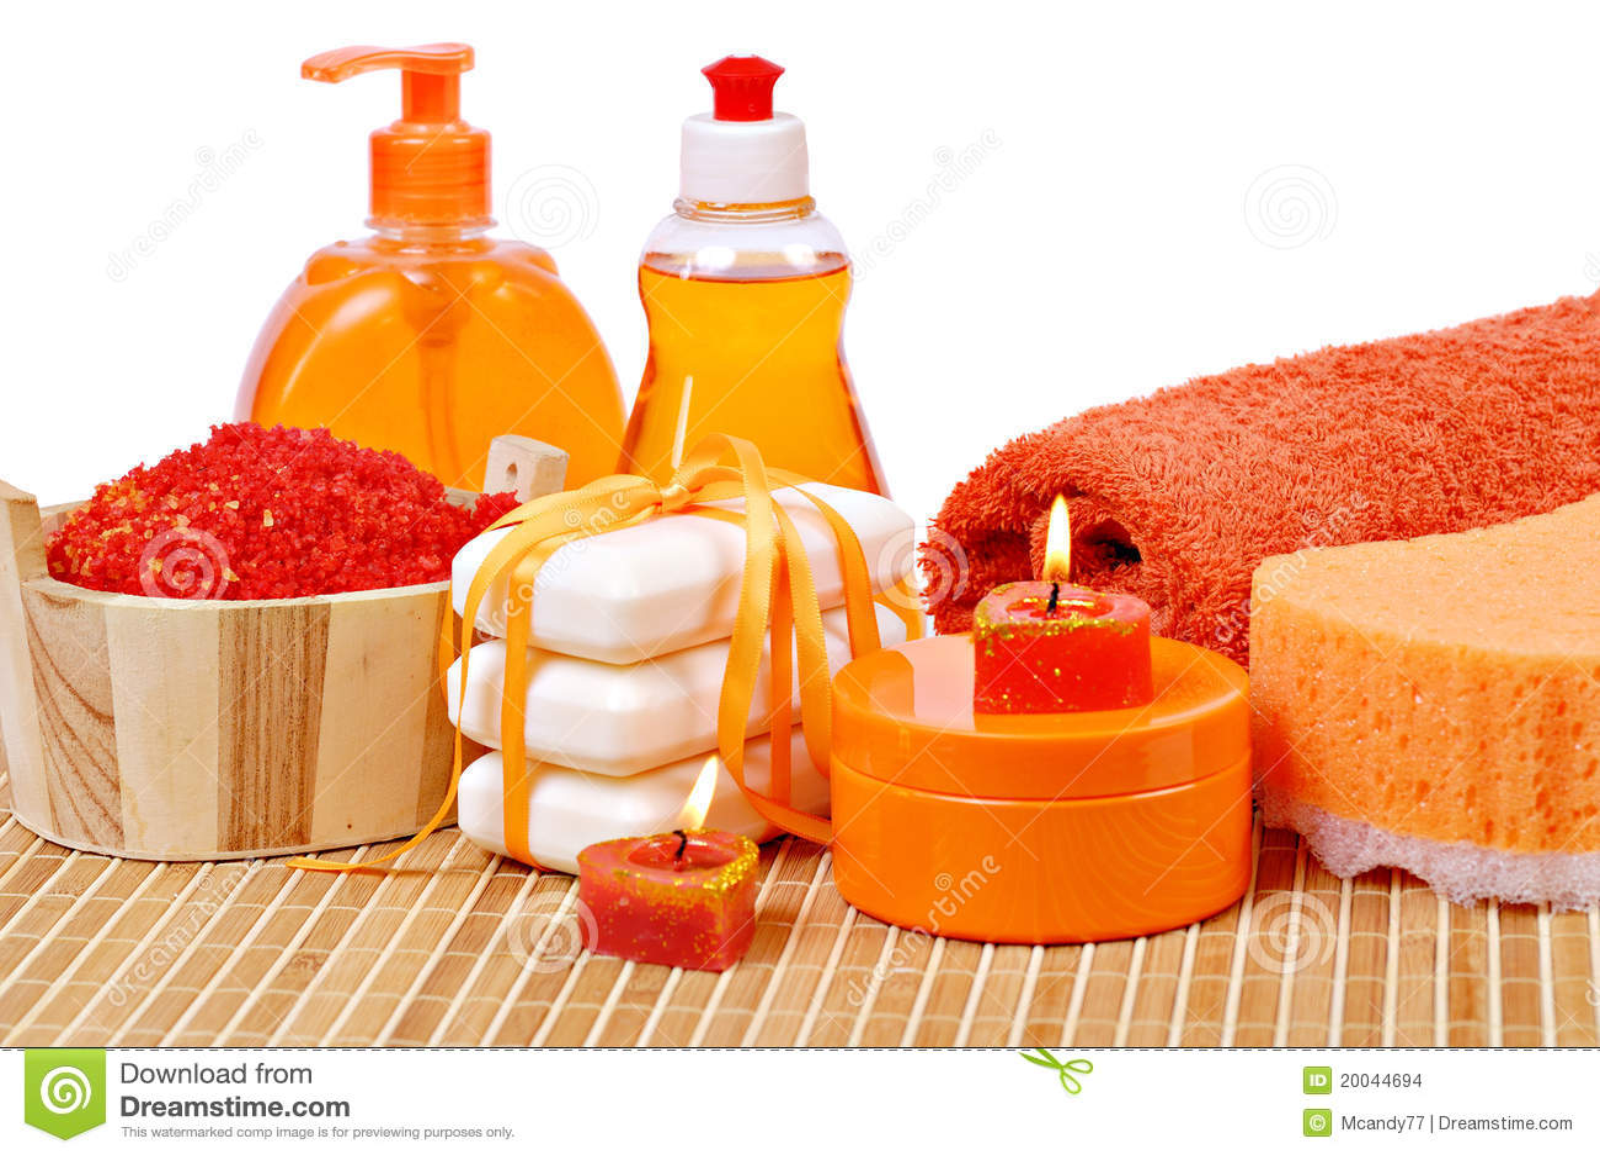 Toilet accessories of orange color stock images image for Orange toilet accessories